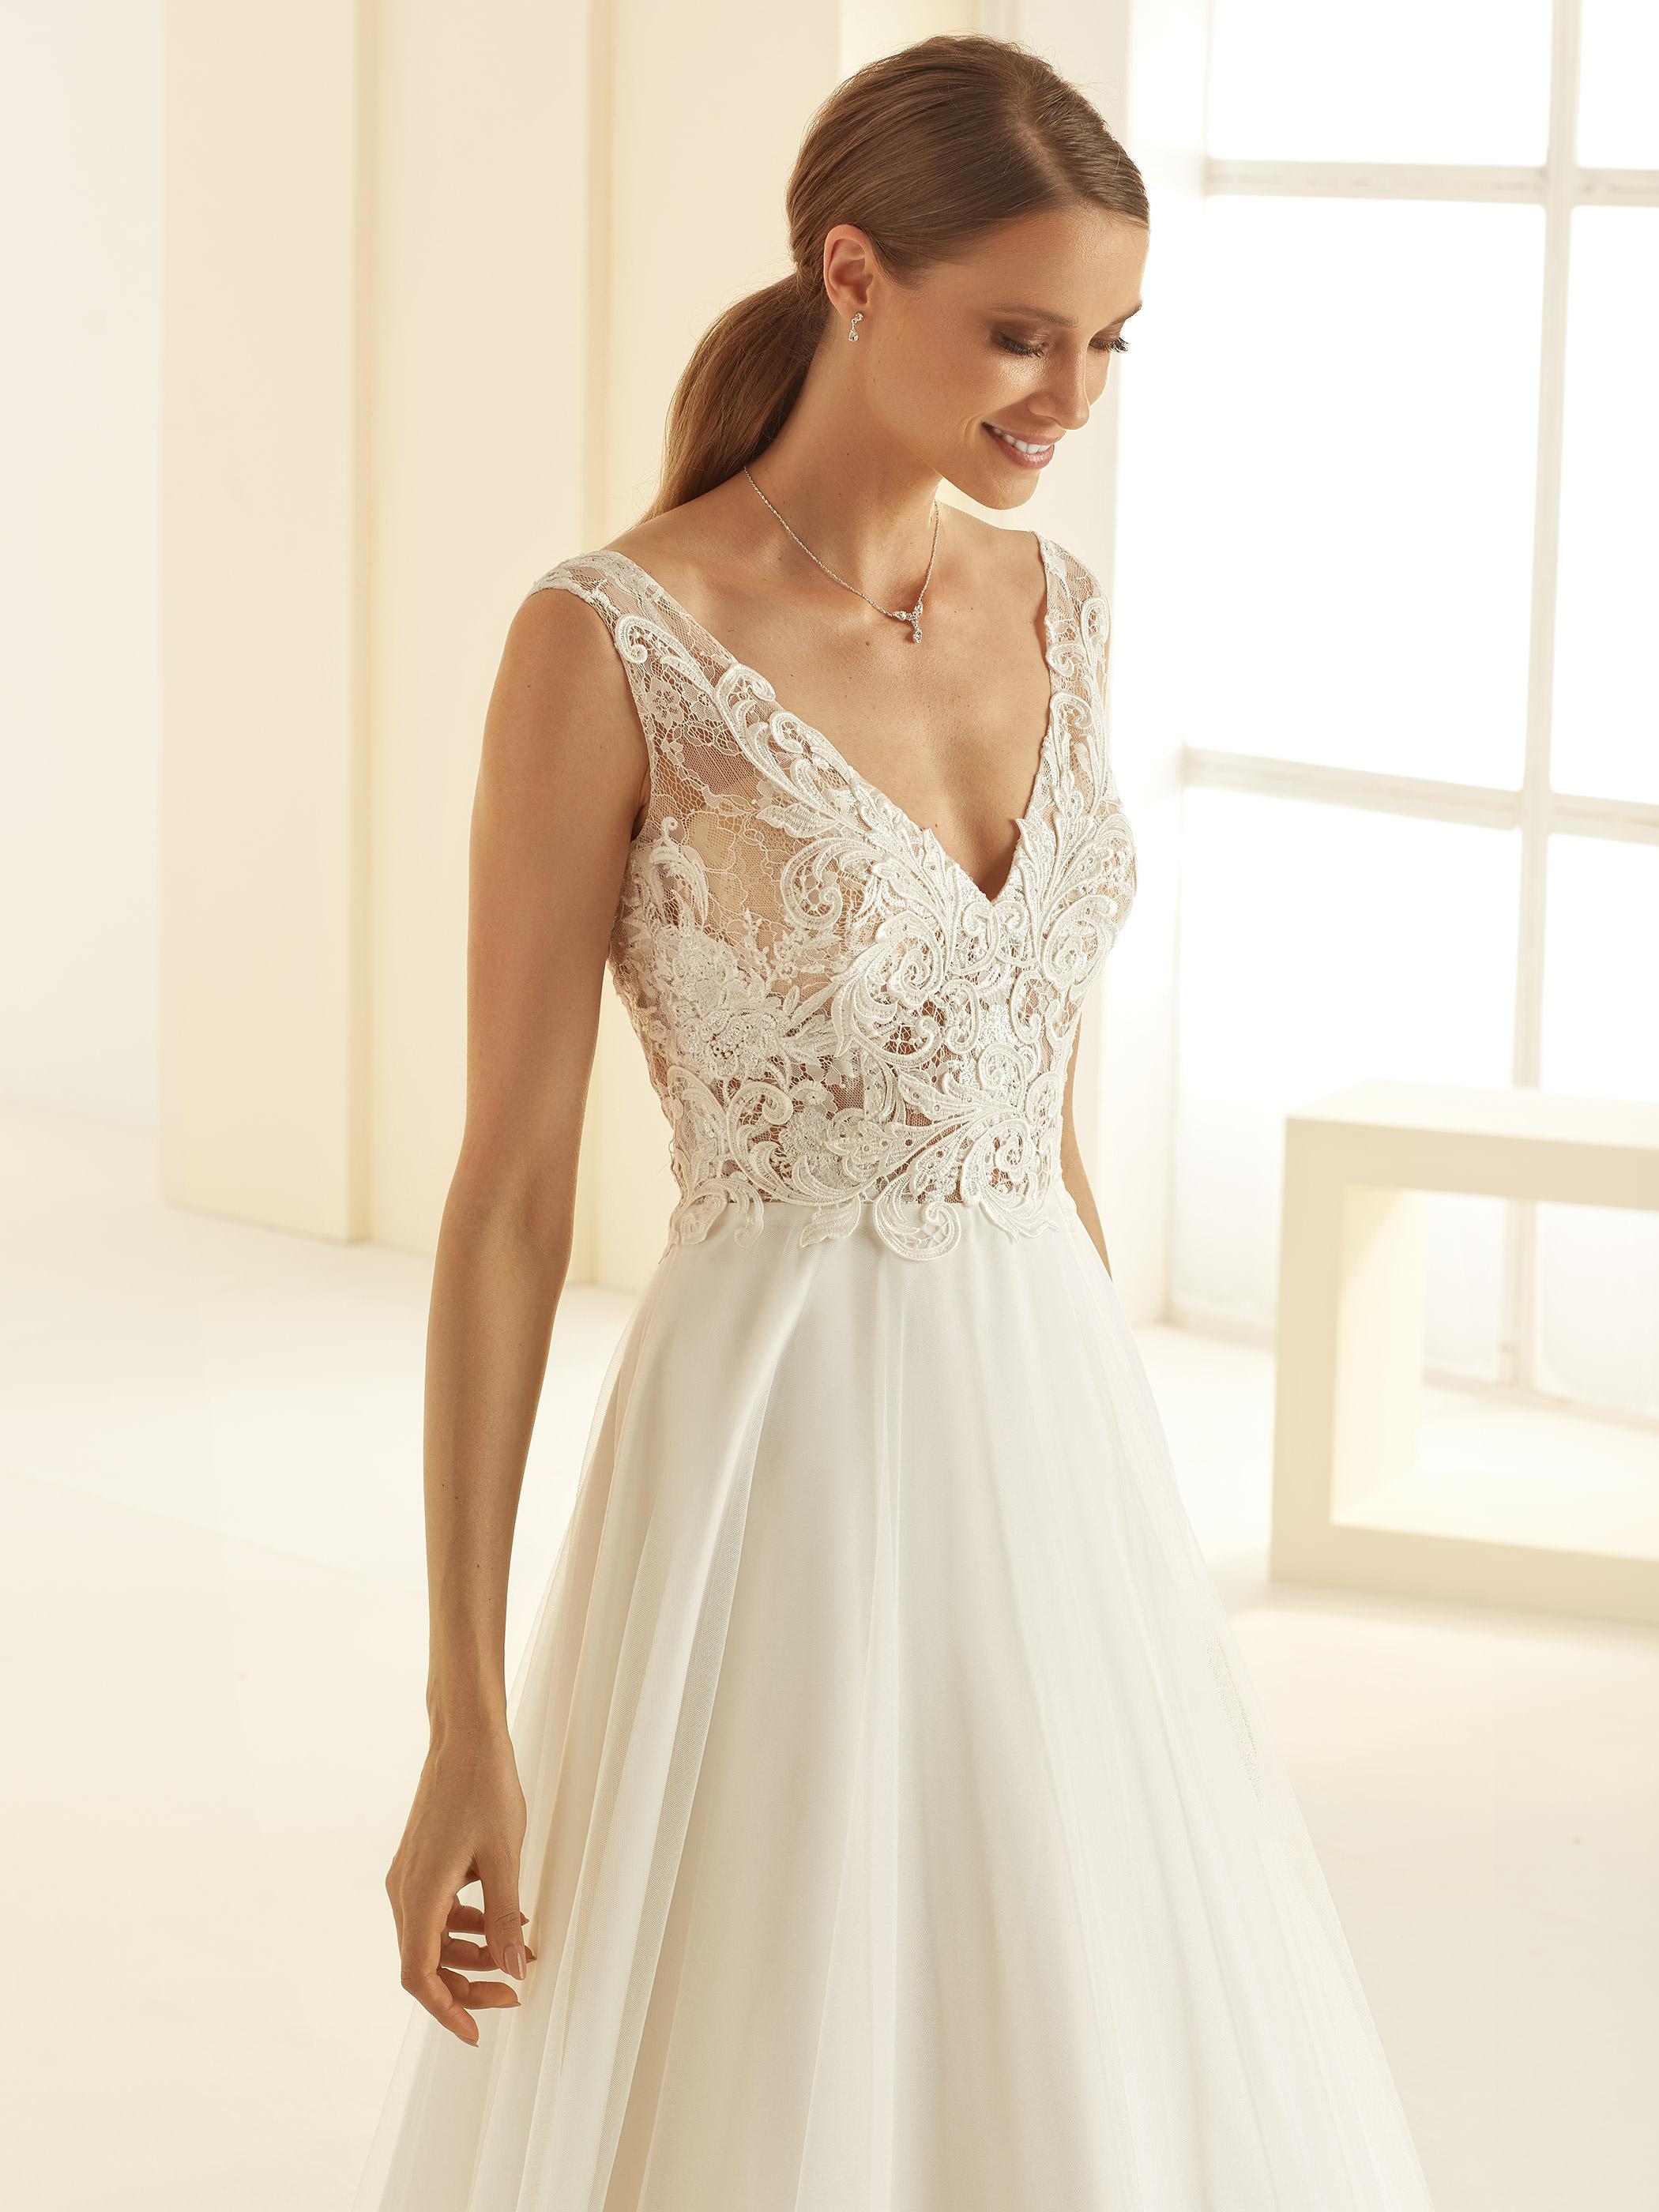 Bianco Evento - Preciosa, Ivory/Nude: Plus Size 44